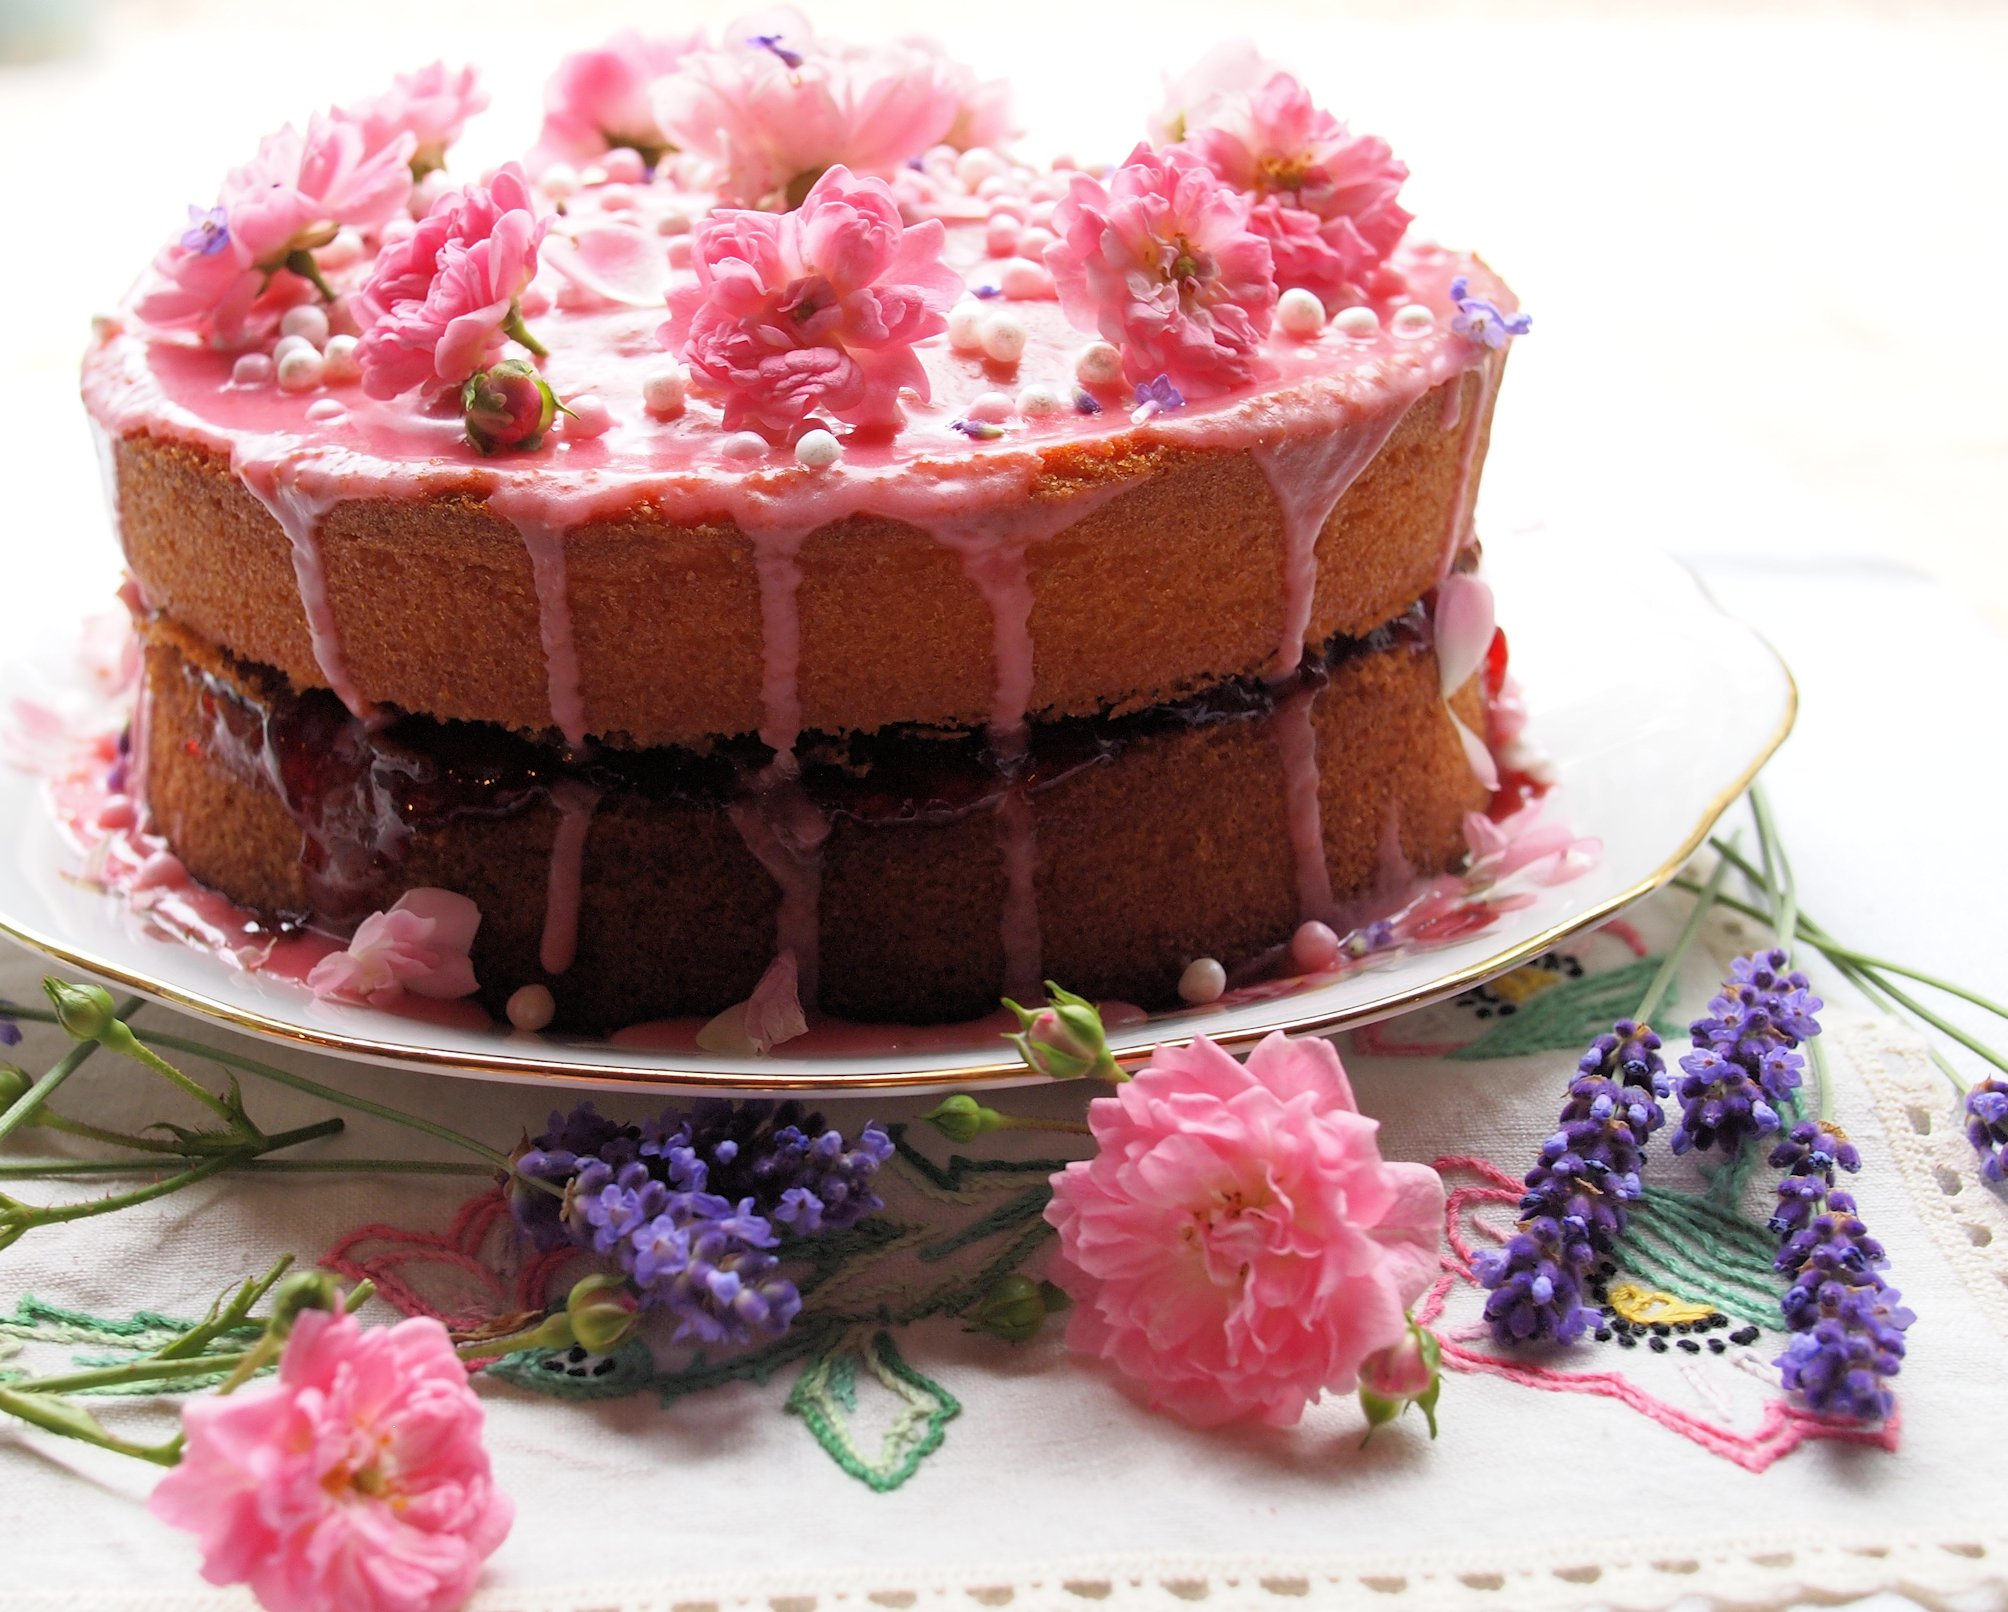 Vanilla Strawberry Rose Victoria Sponge Cake for Lavender and